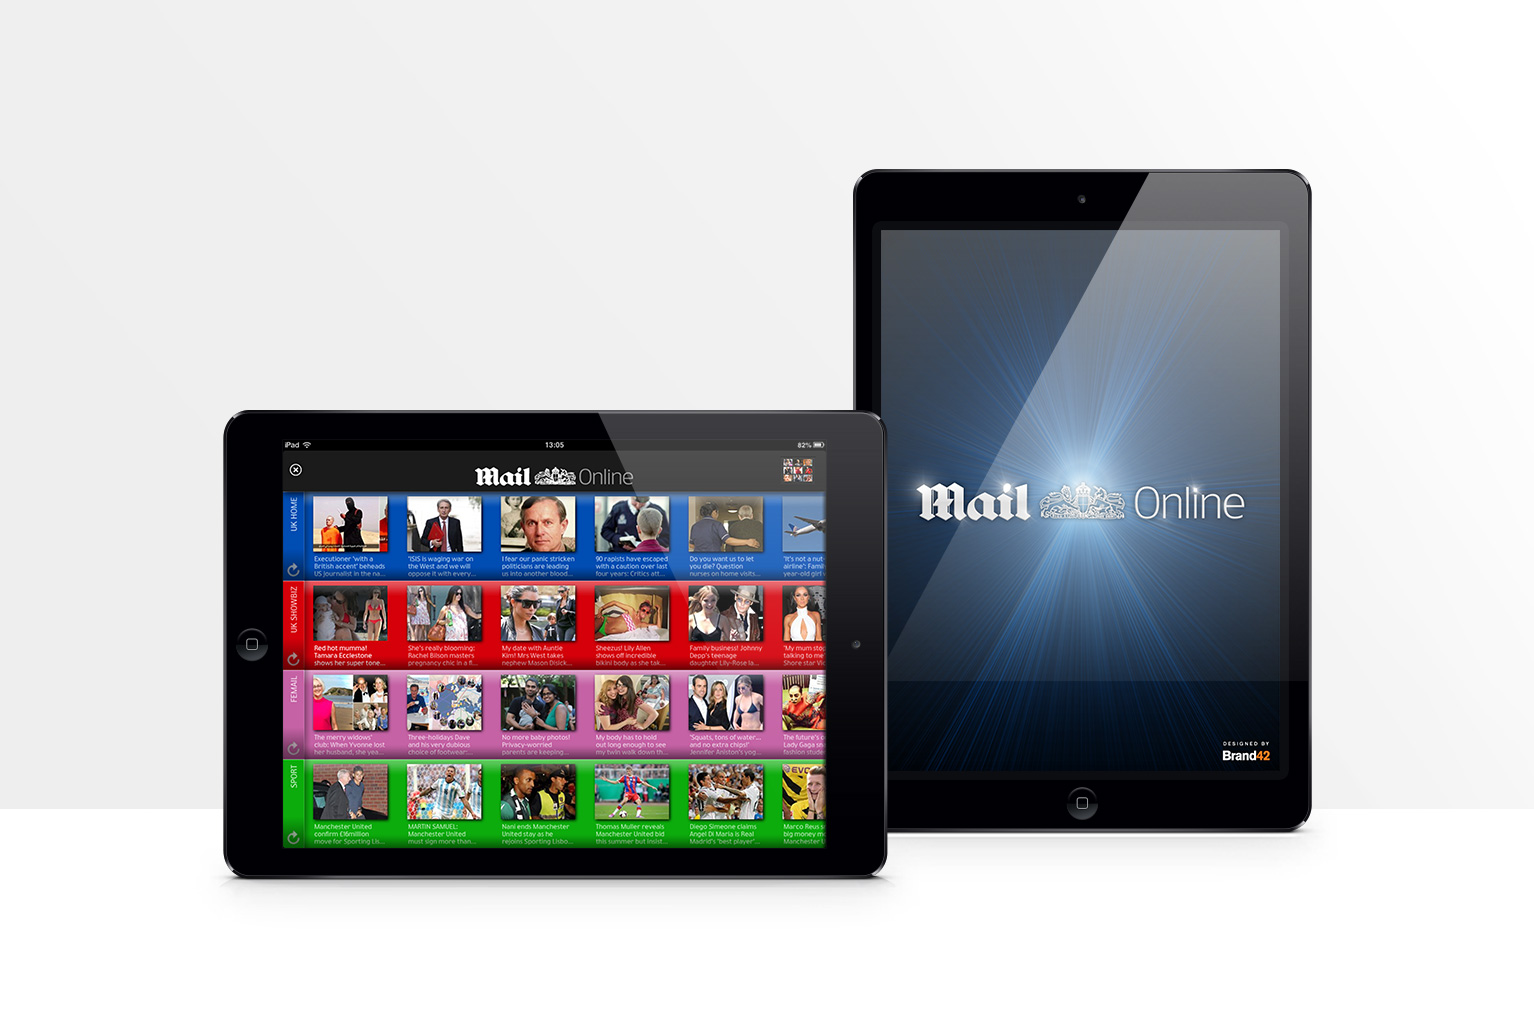 MailOnline iPad App designed by Brand42